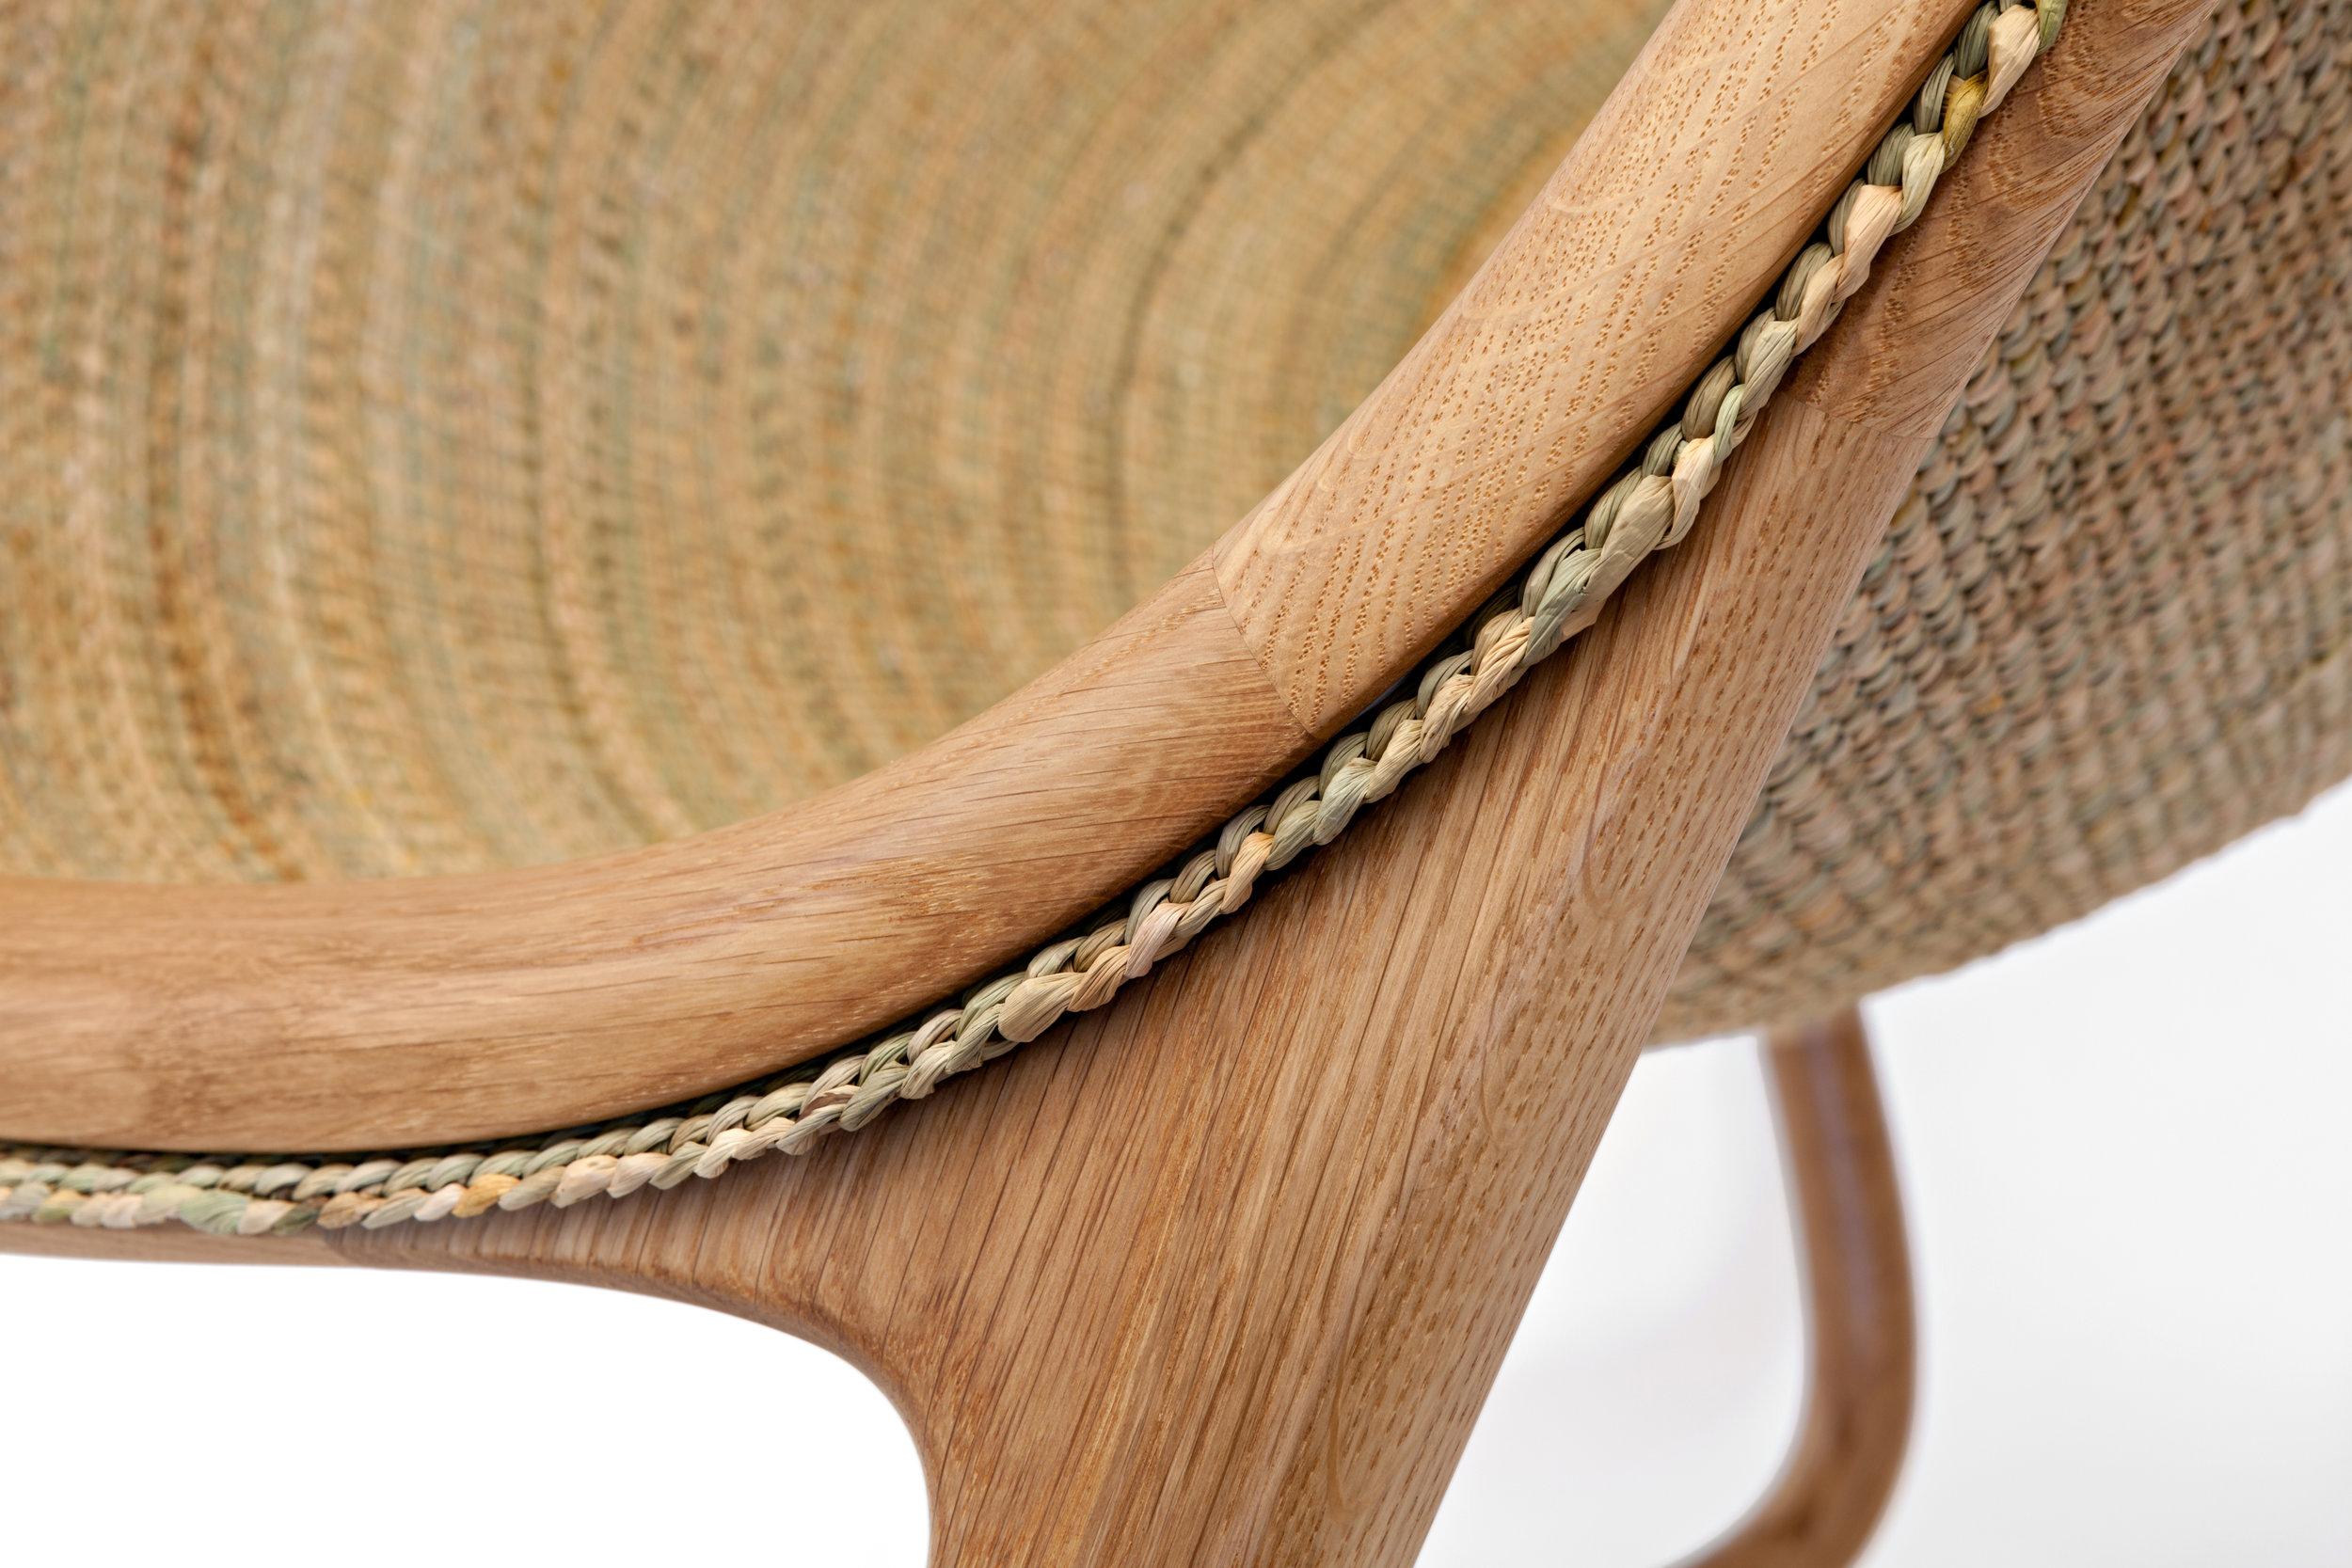 Rush Chair - Detail © Michael Franke